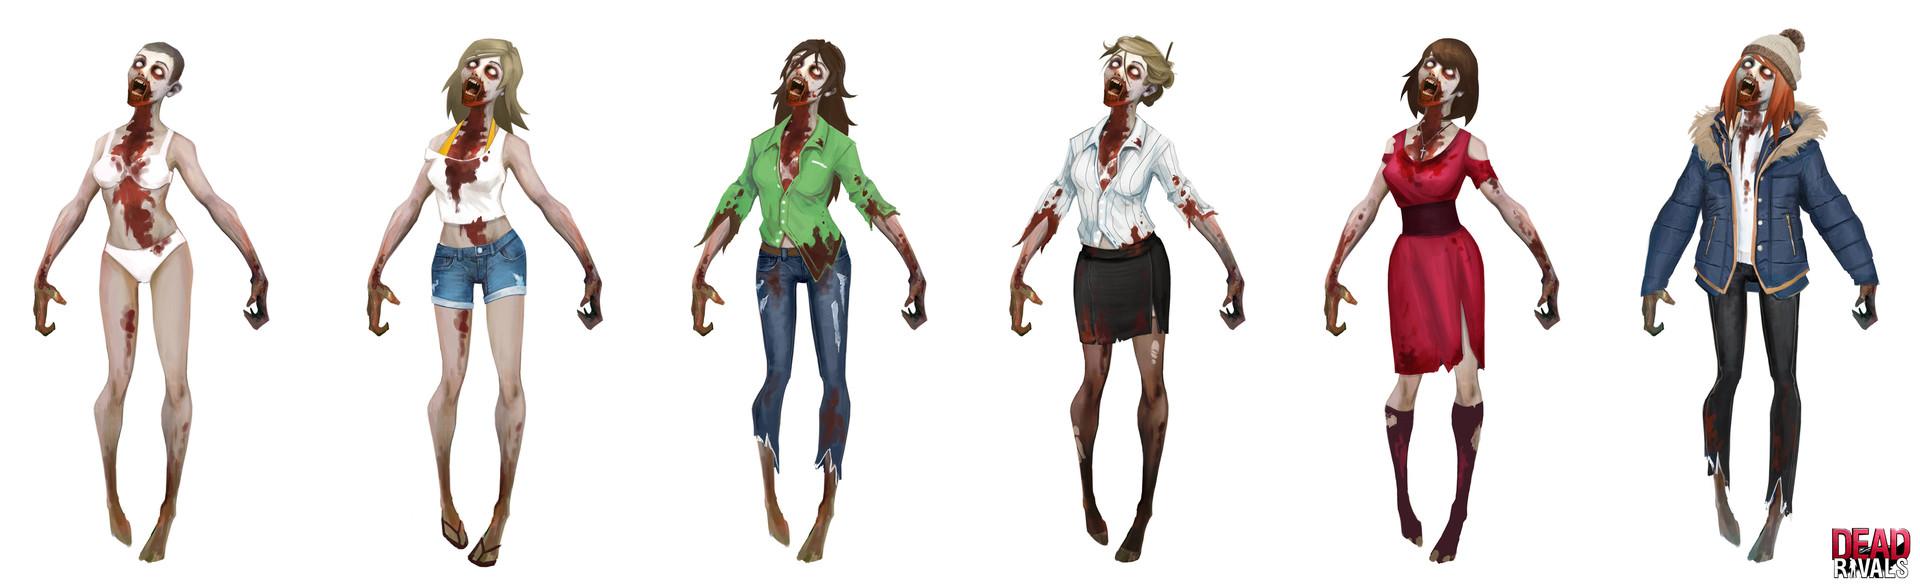 Alexandre chaudret dw characters zombieswoman01